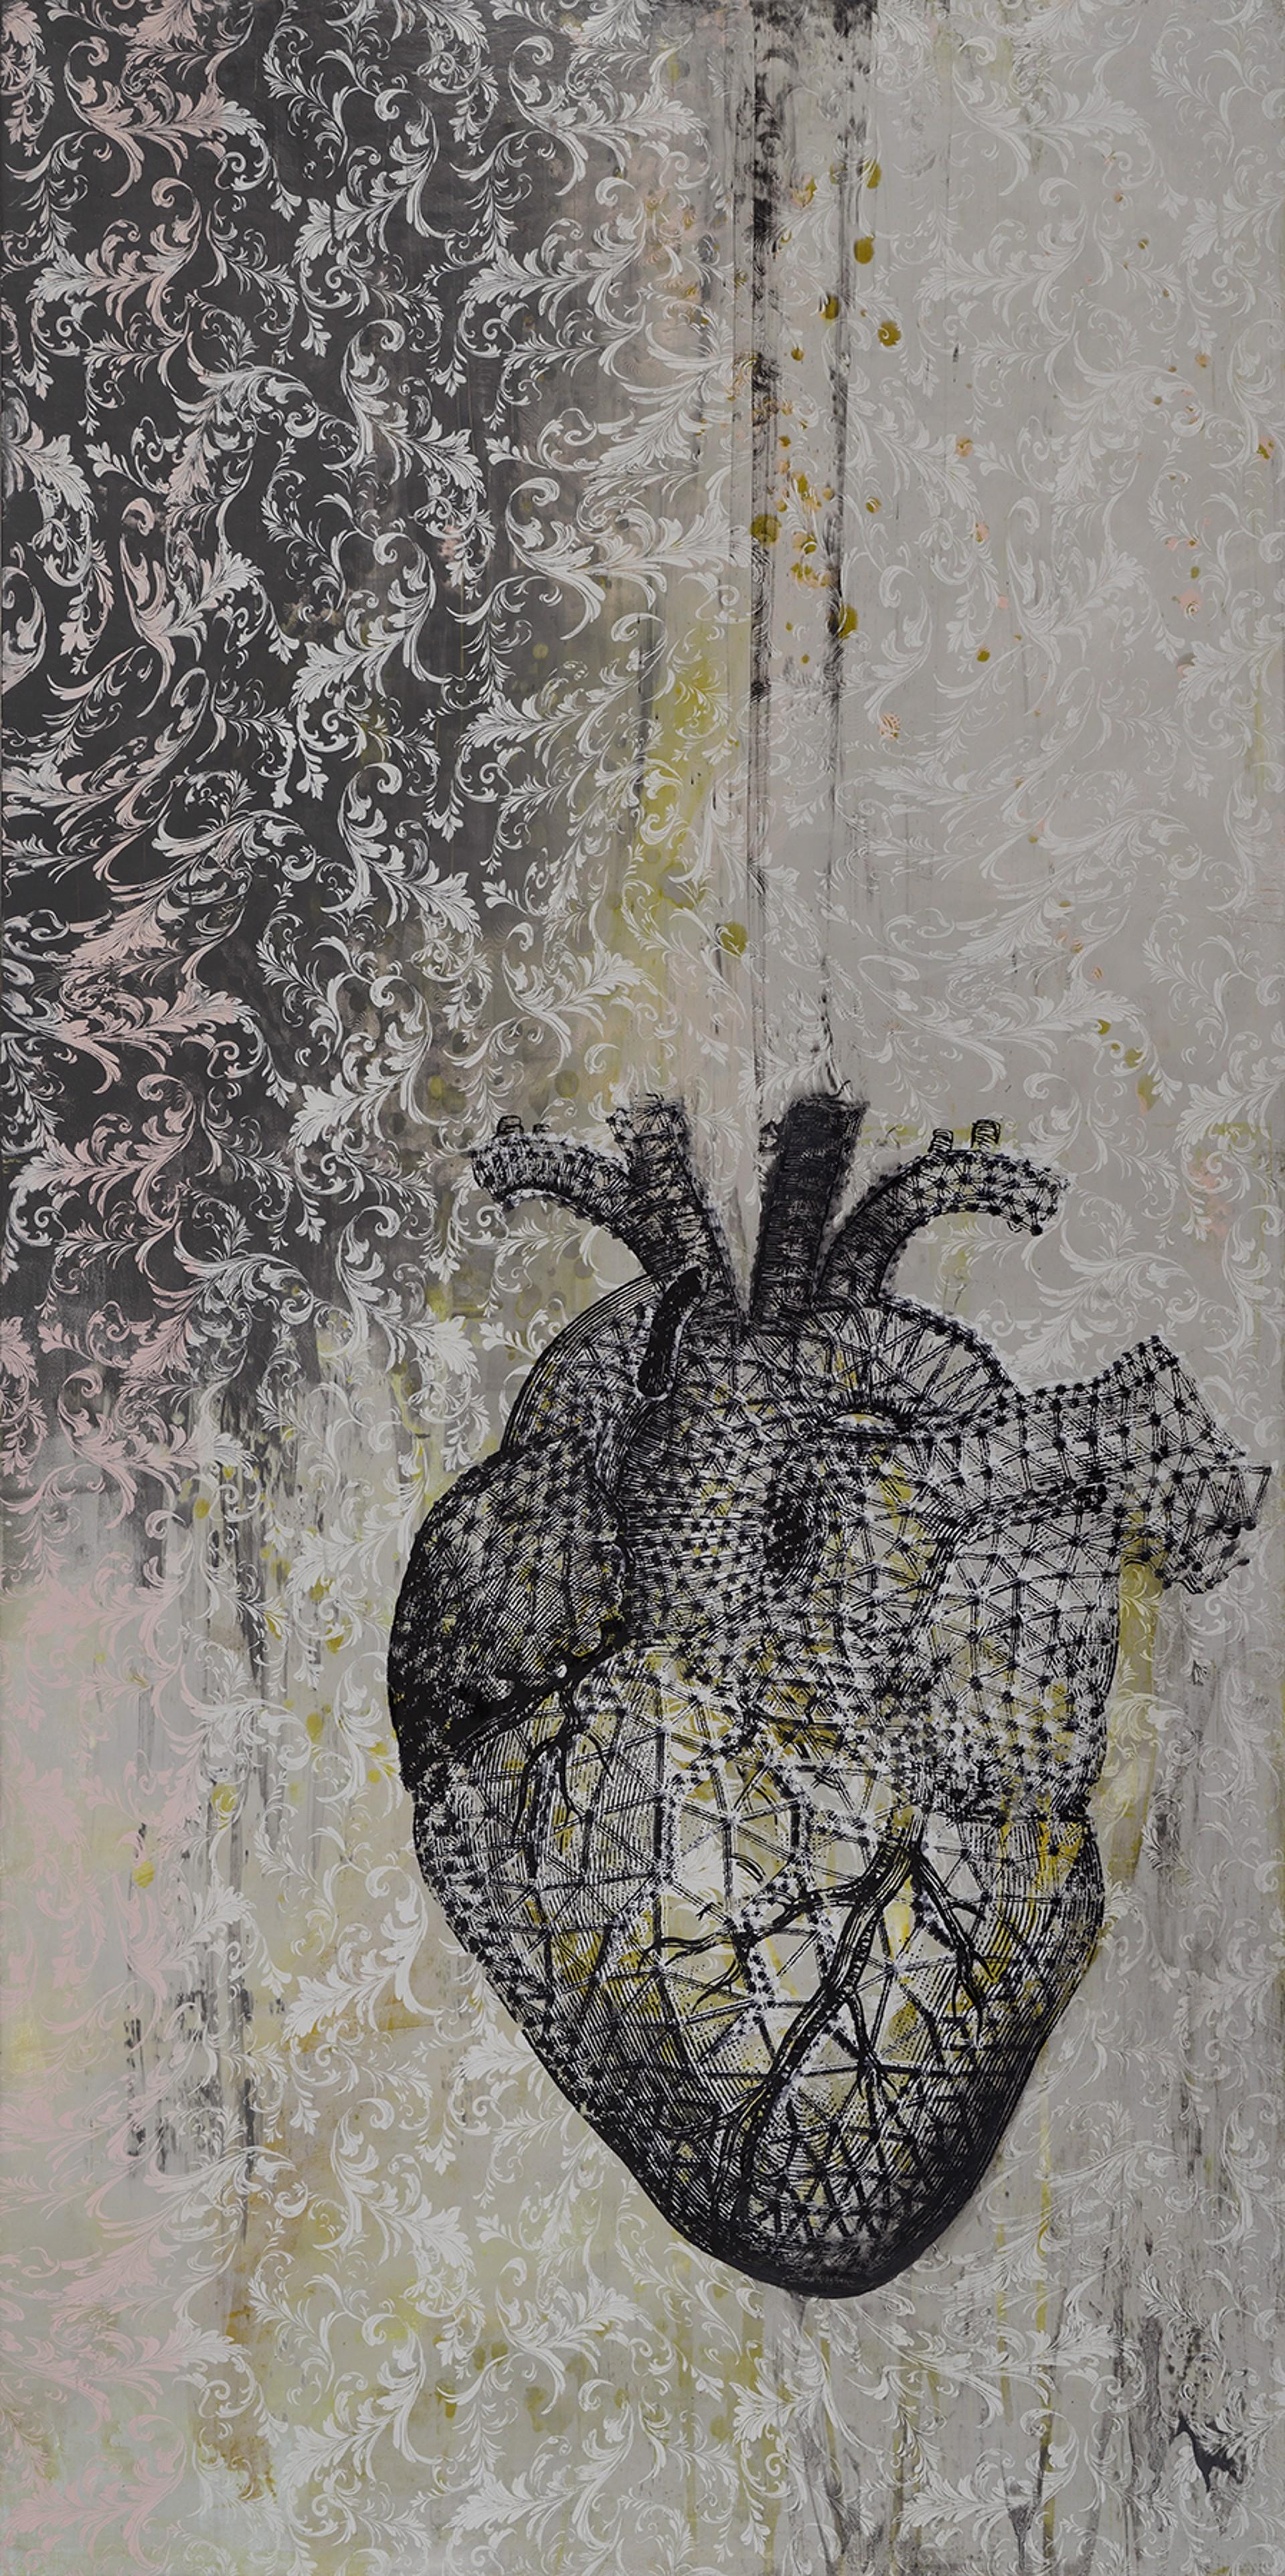 Strange Fruit by Dorothea Van Camp